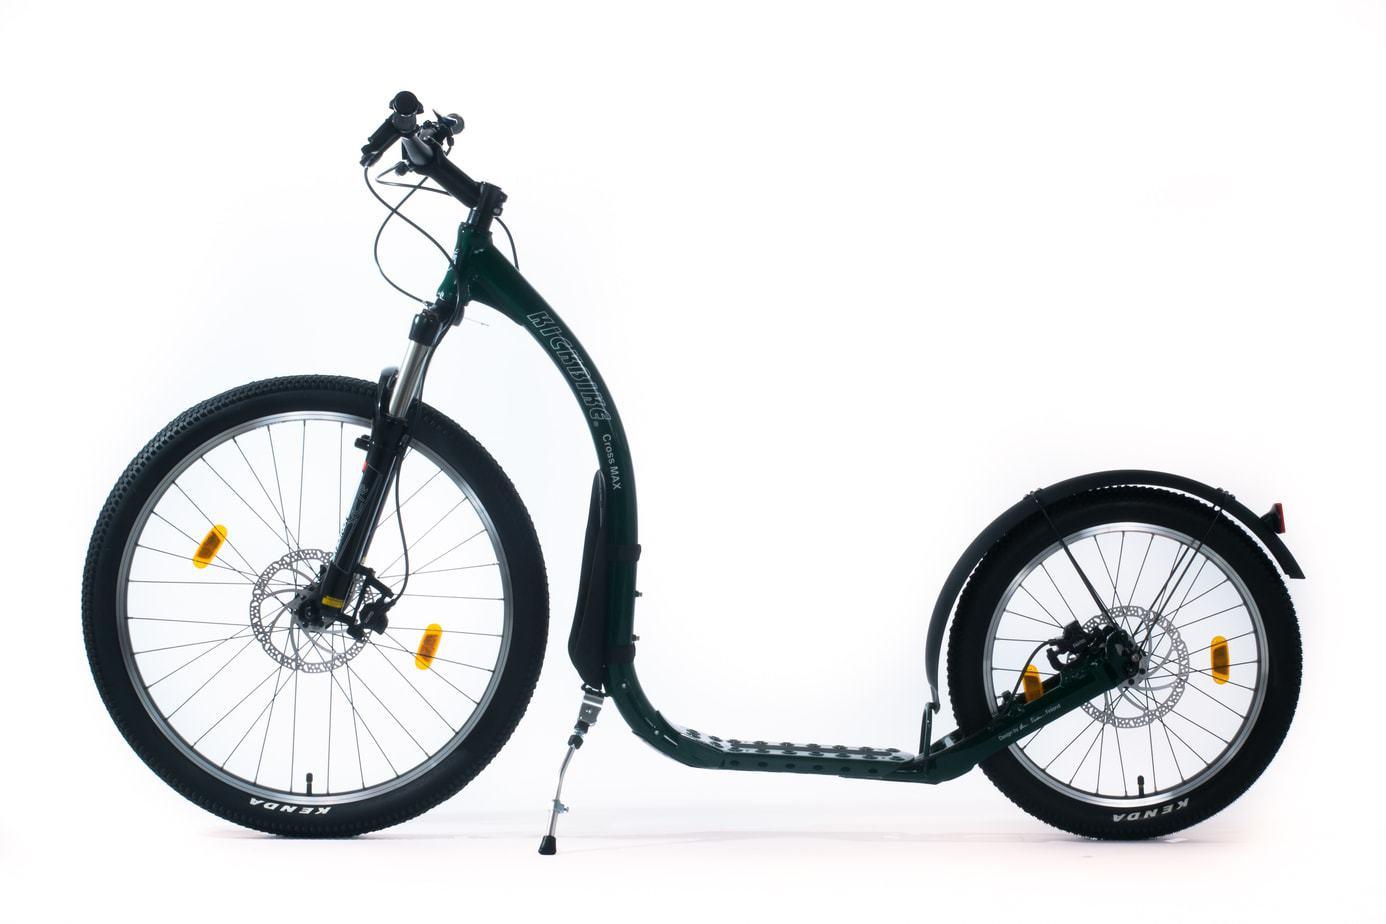 kickbike cross max 20hd g nstig online kaufen. Black Bedroom Furniture Sets. Home Design Ideas